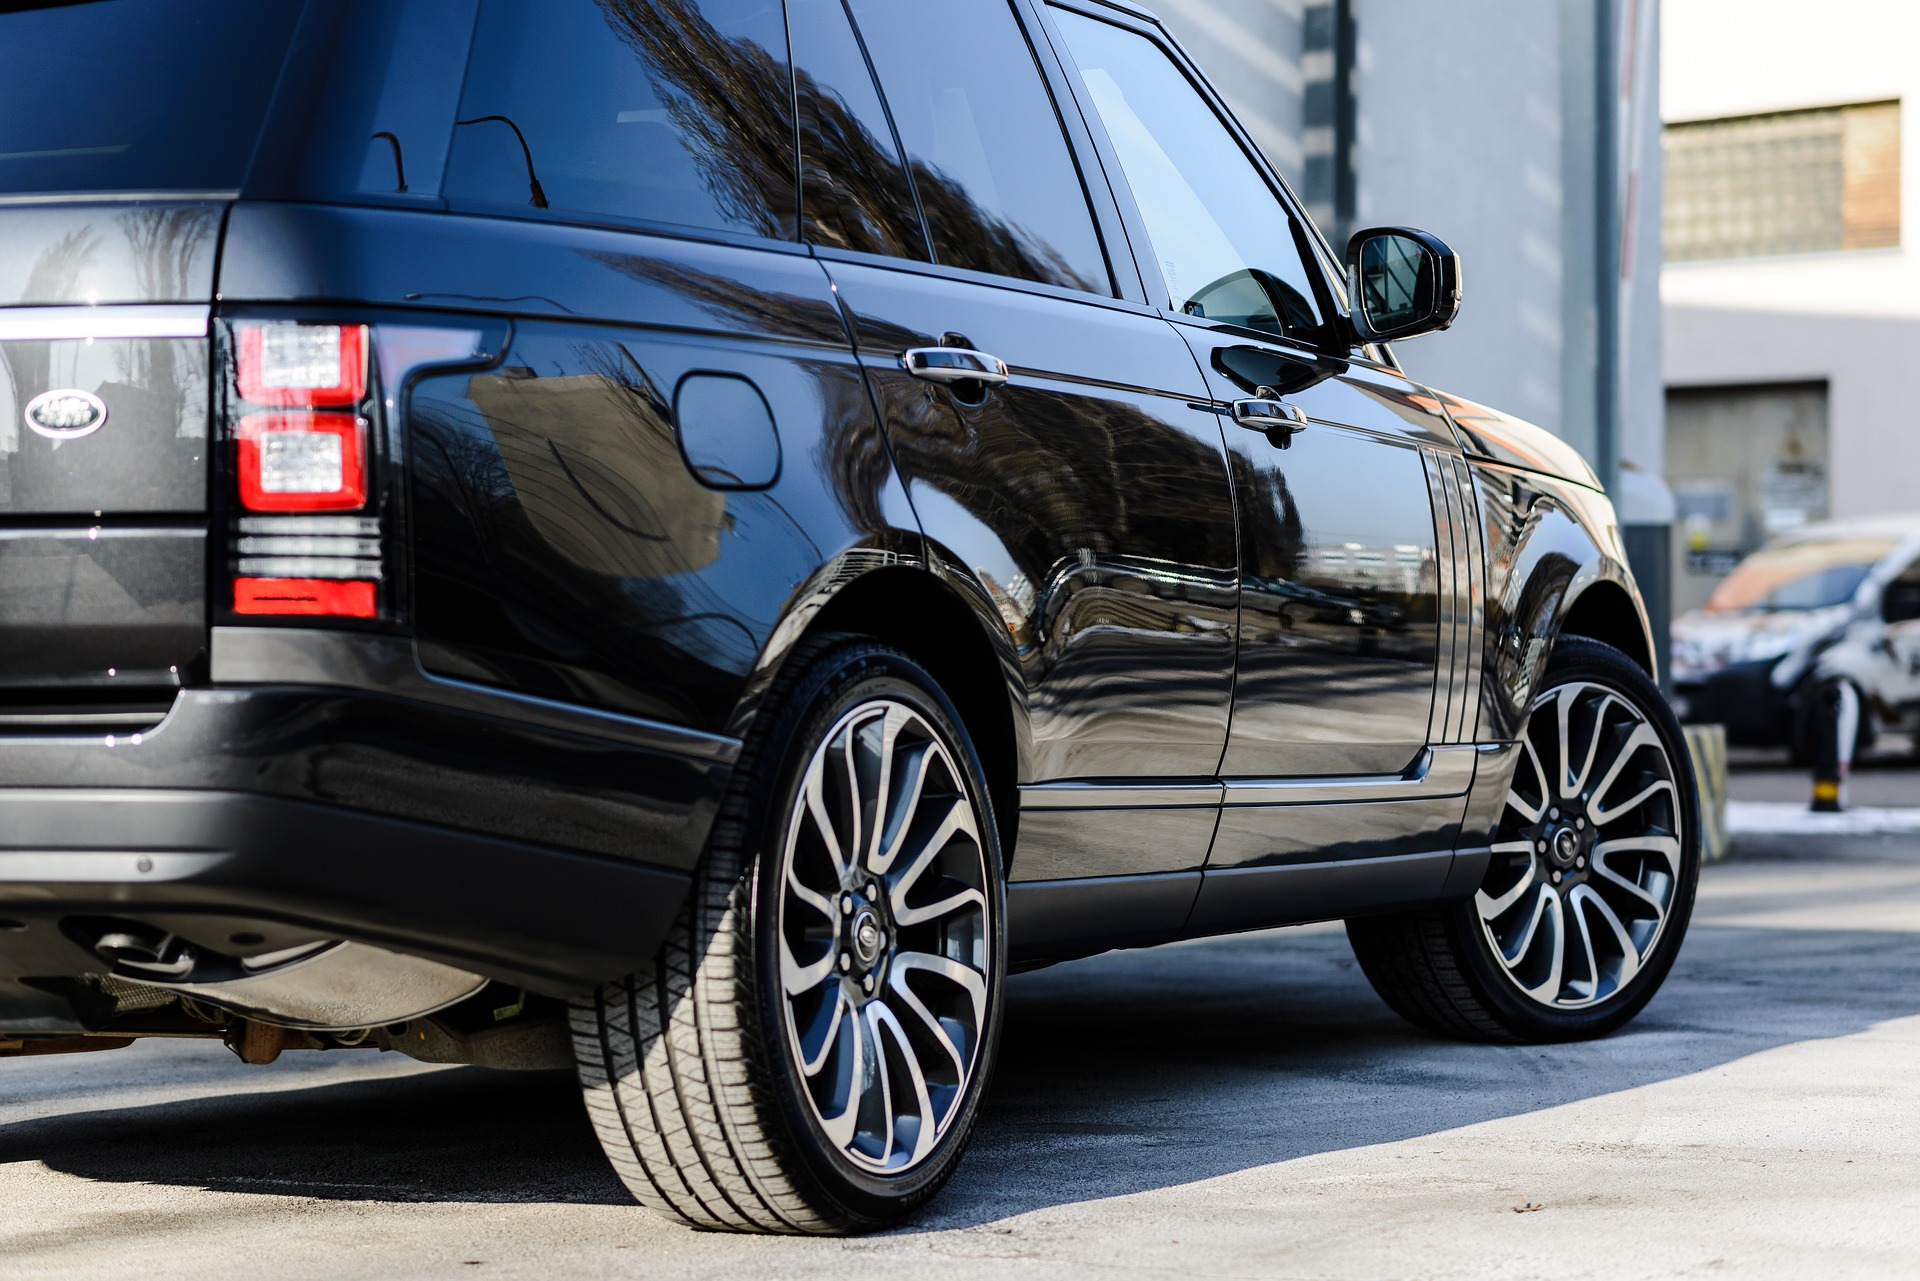 Black Range Rover Vogue